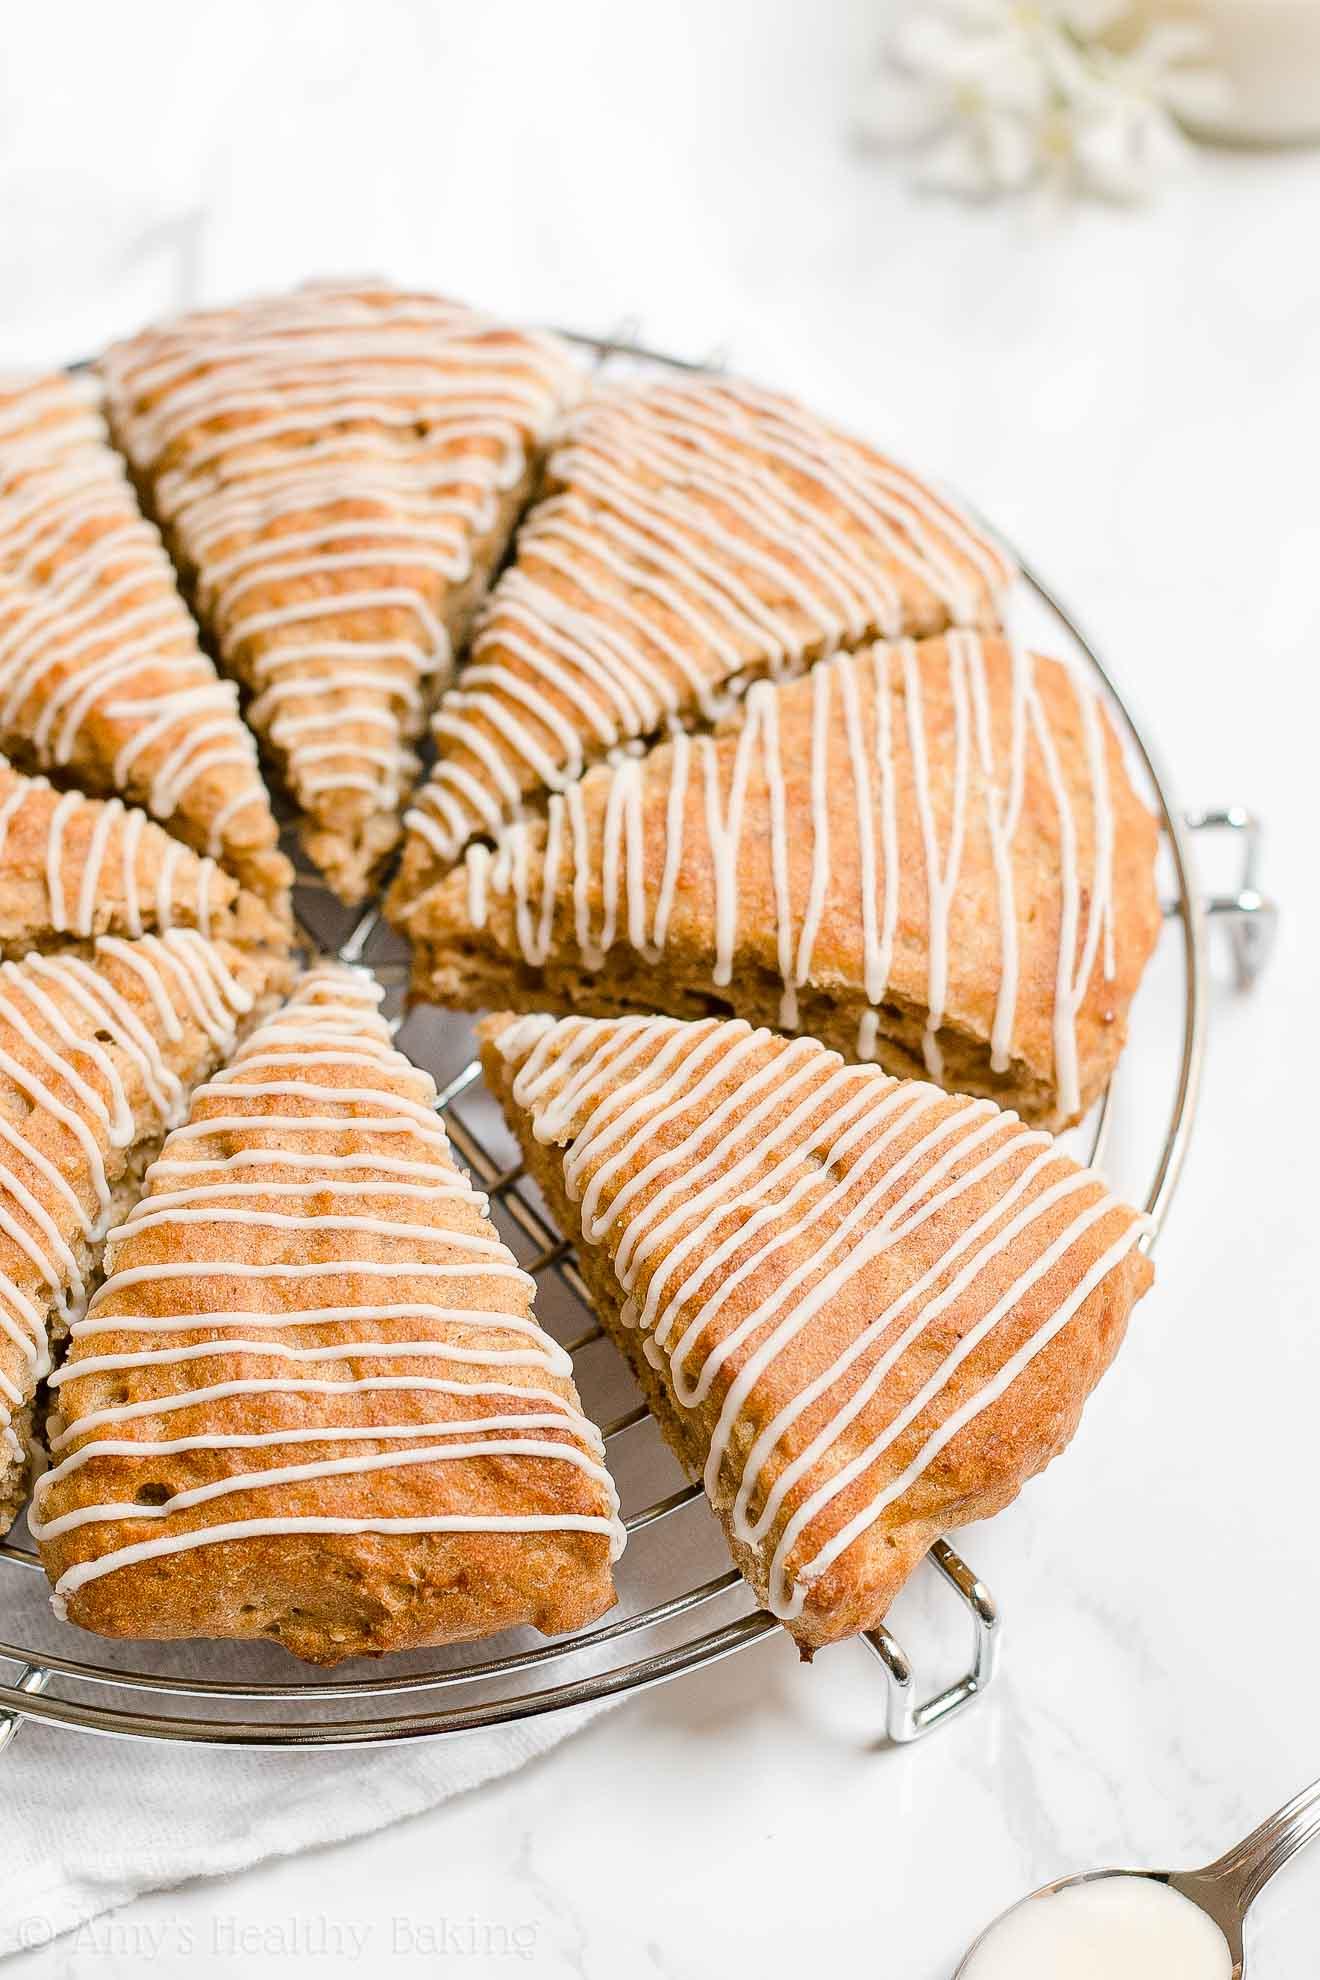 Moist Healthy Gluten Free Banana Buttermilk Scones